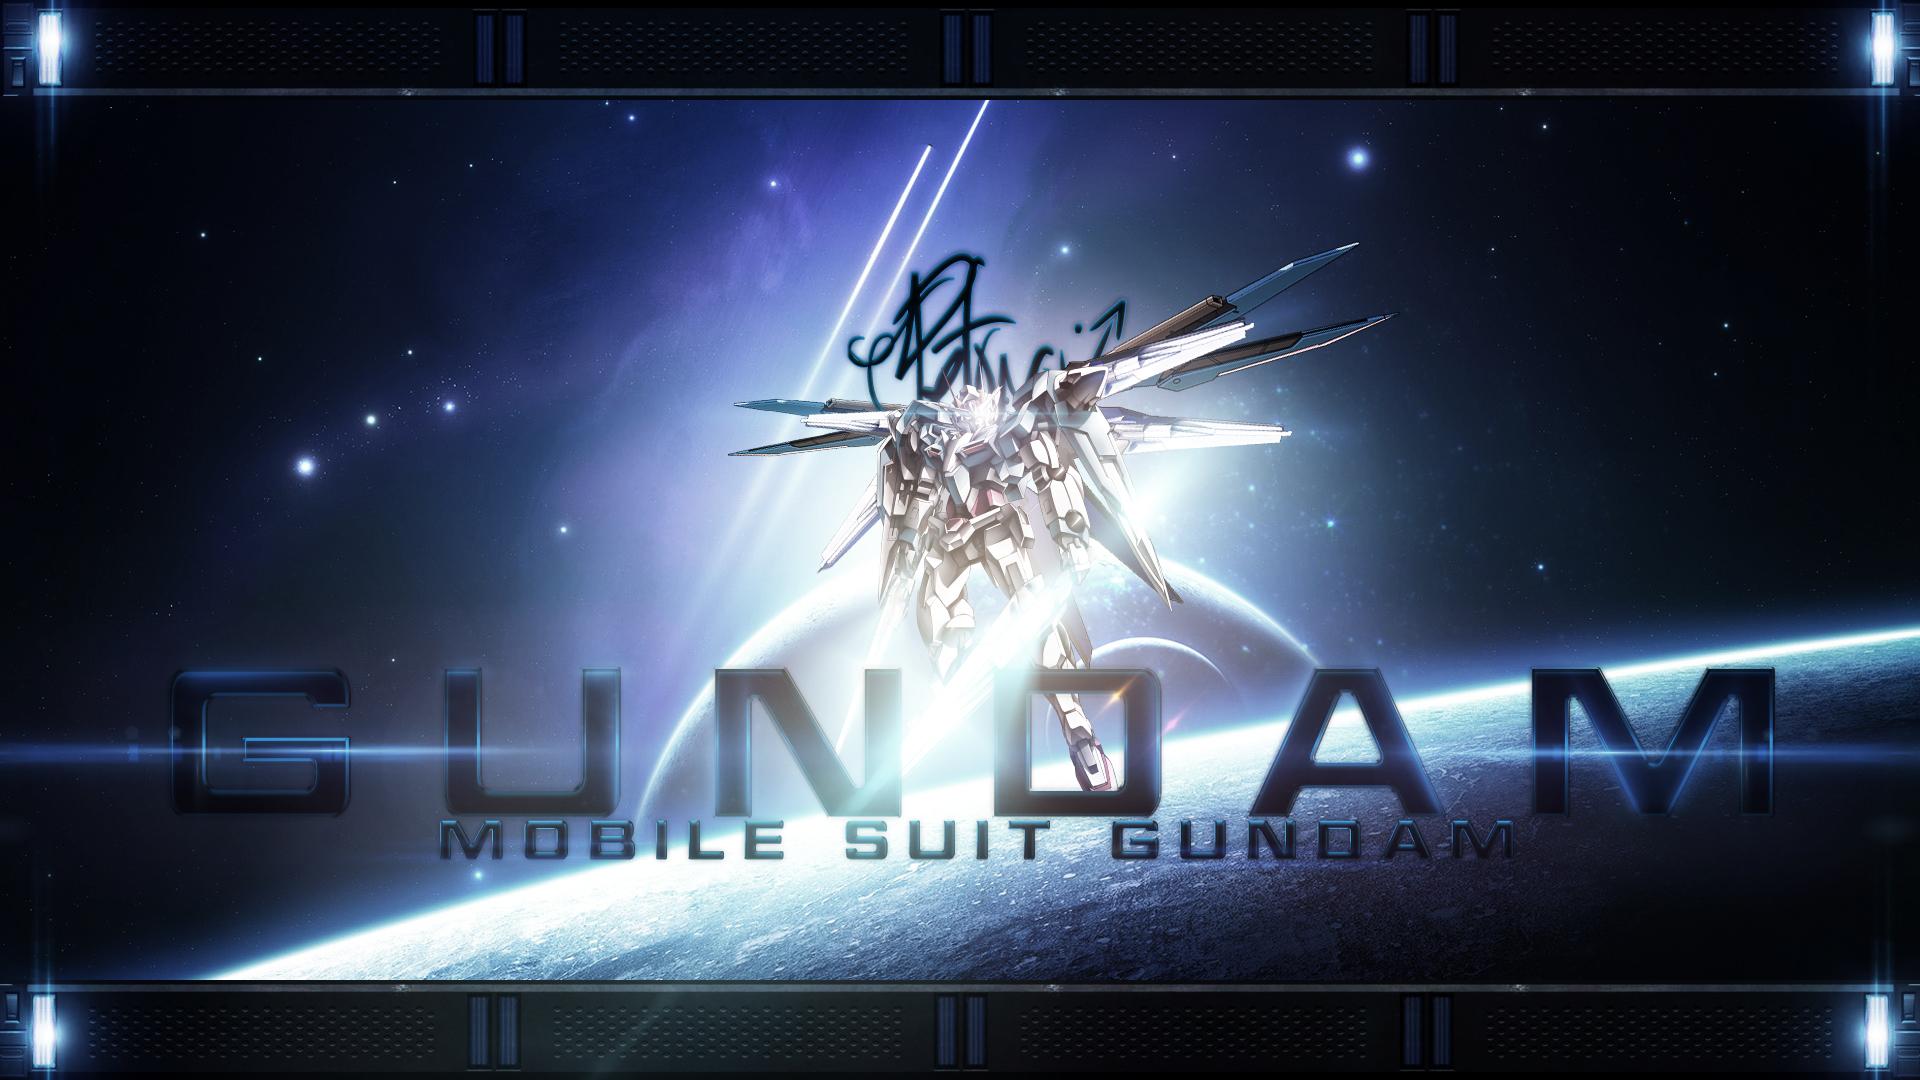 Gundam 00 Wallpaper by Pwn3ge by HaseoBg 1920x1080